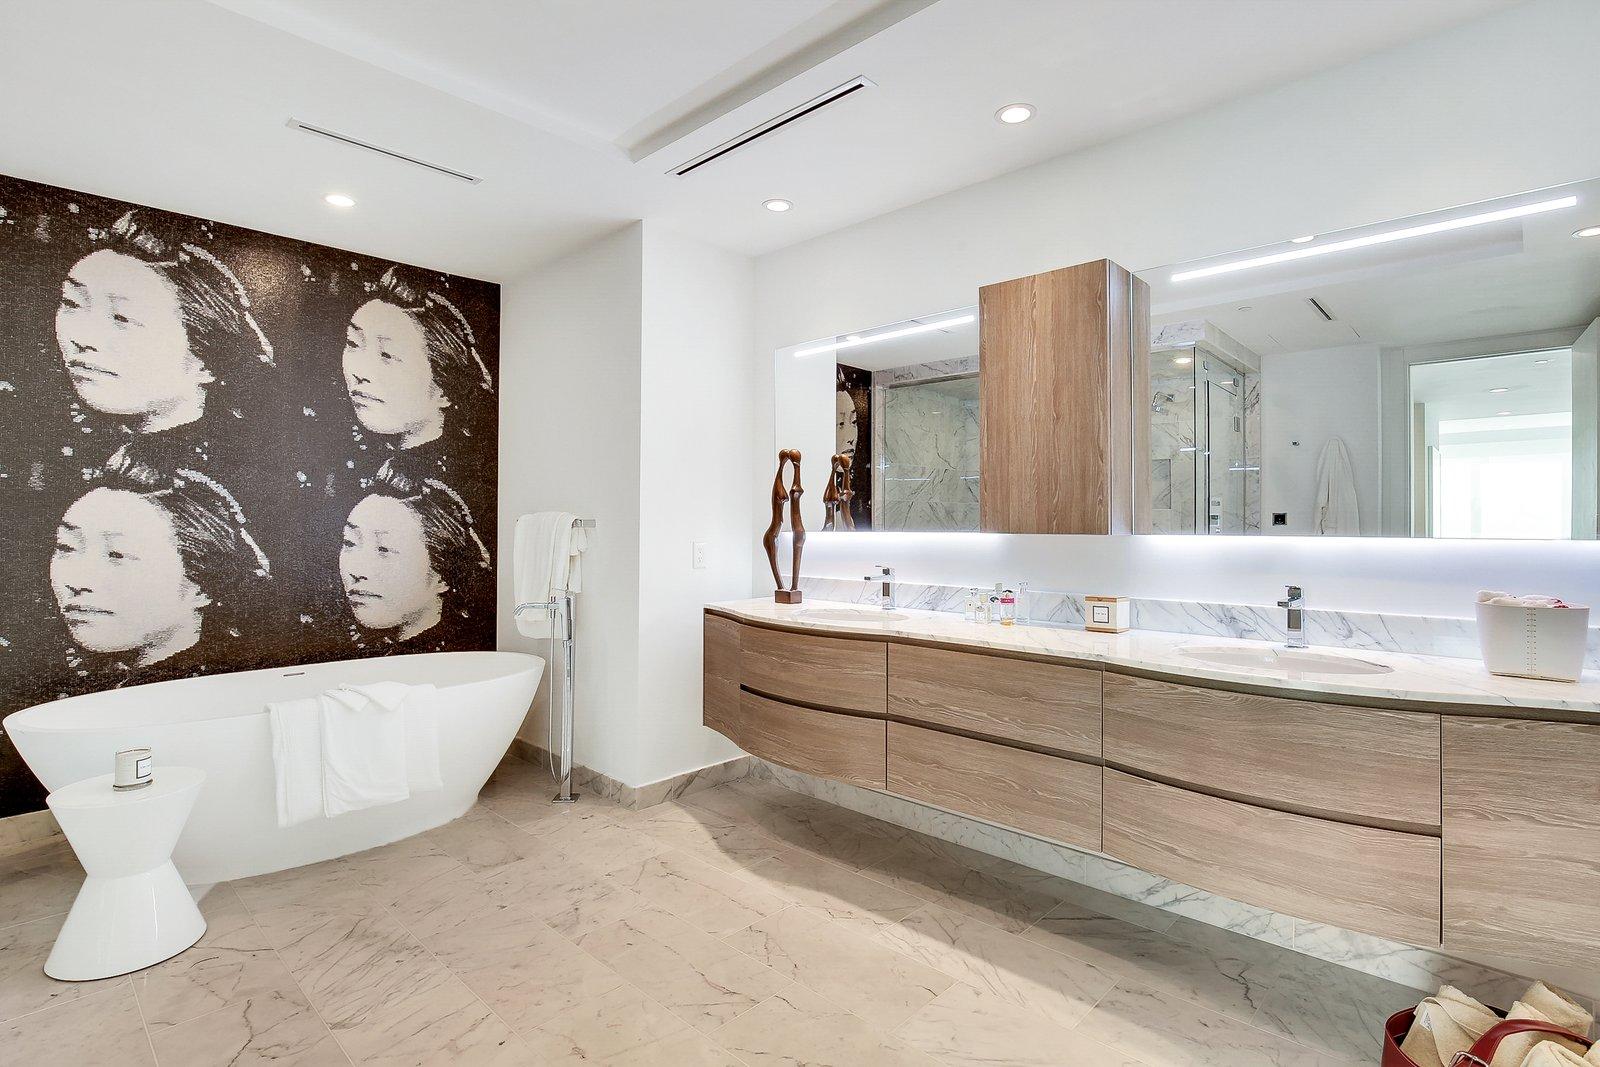 Bath Room  Striking, Modern Waterfront Residences Debut Along Fort Lauderdale's Picturesque Sunset Lake